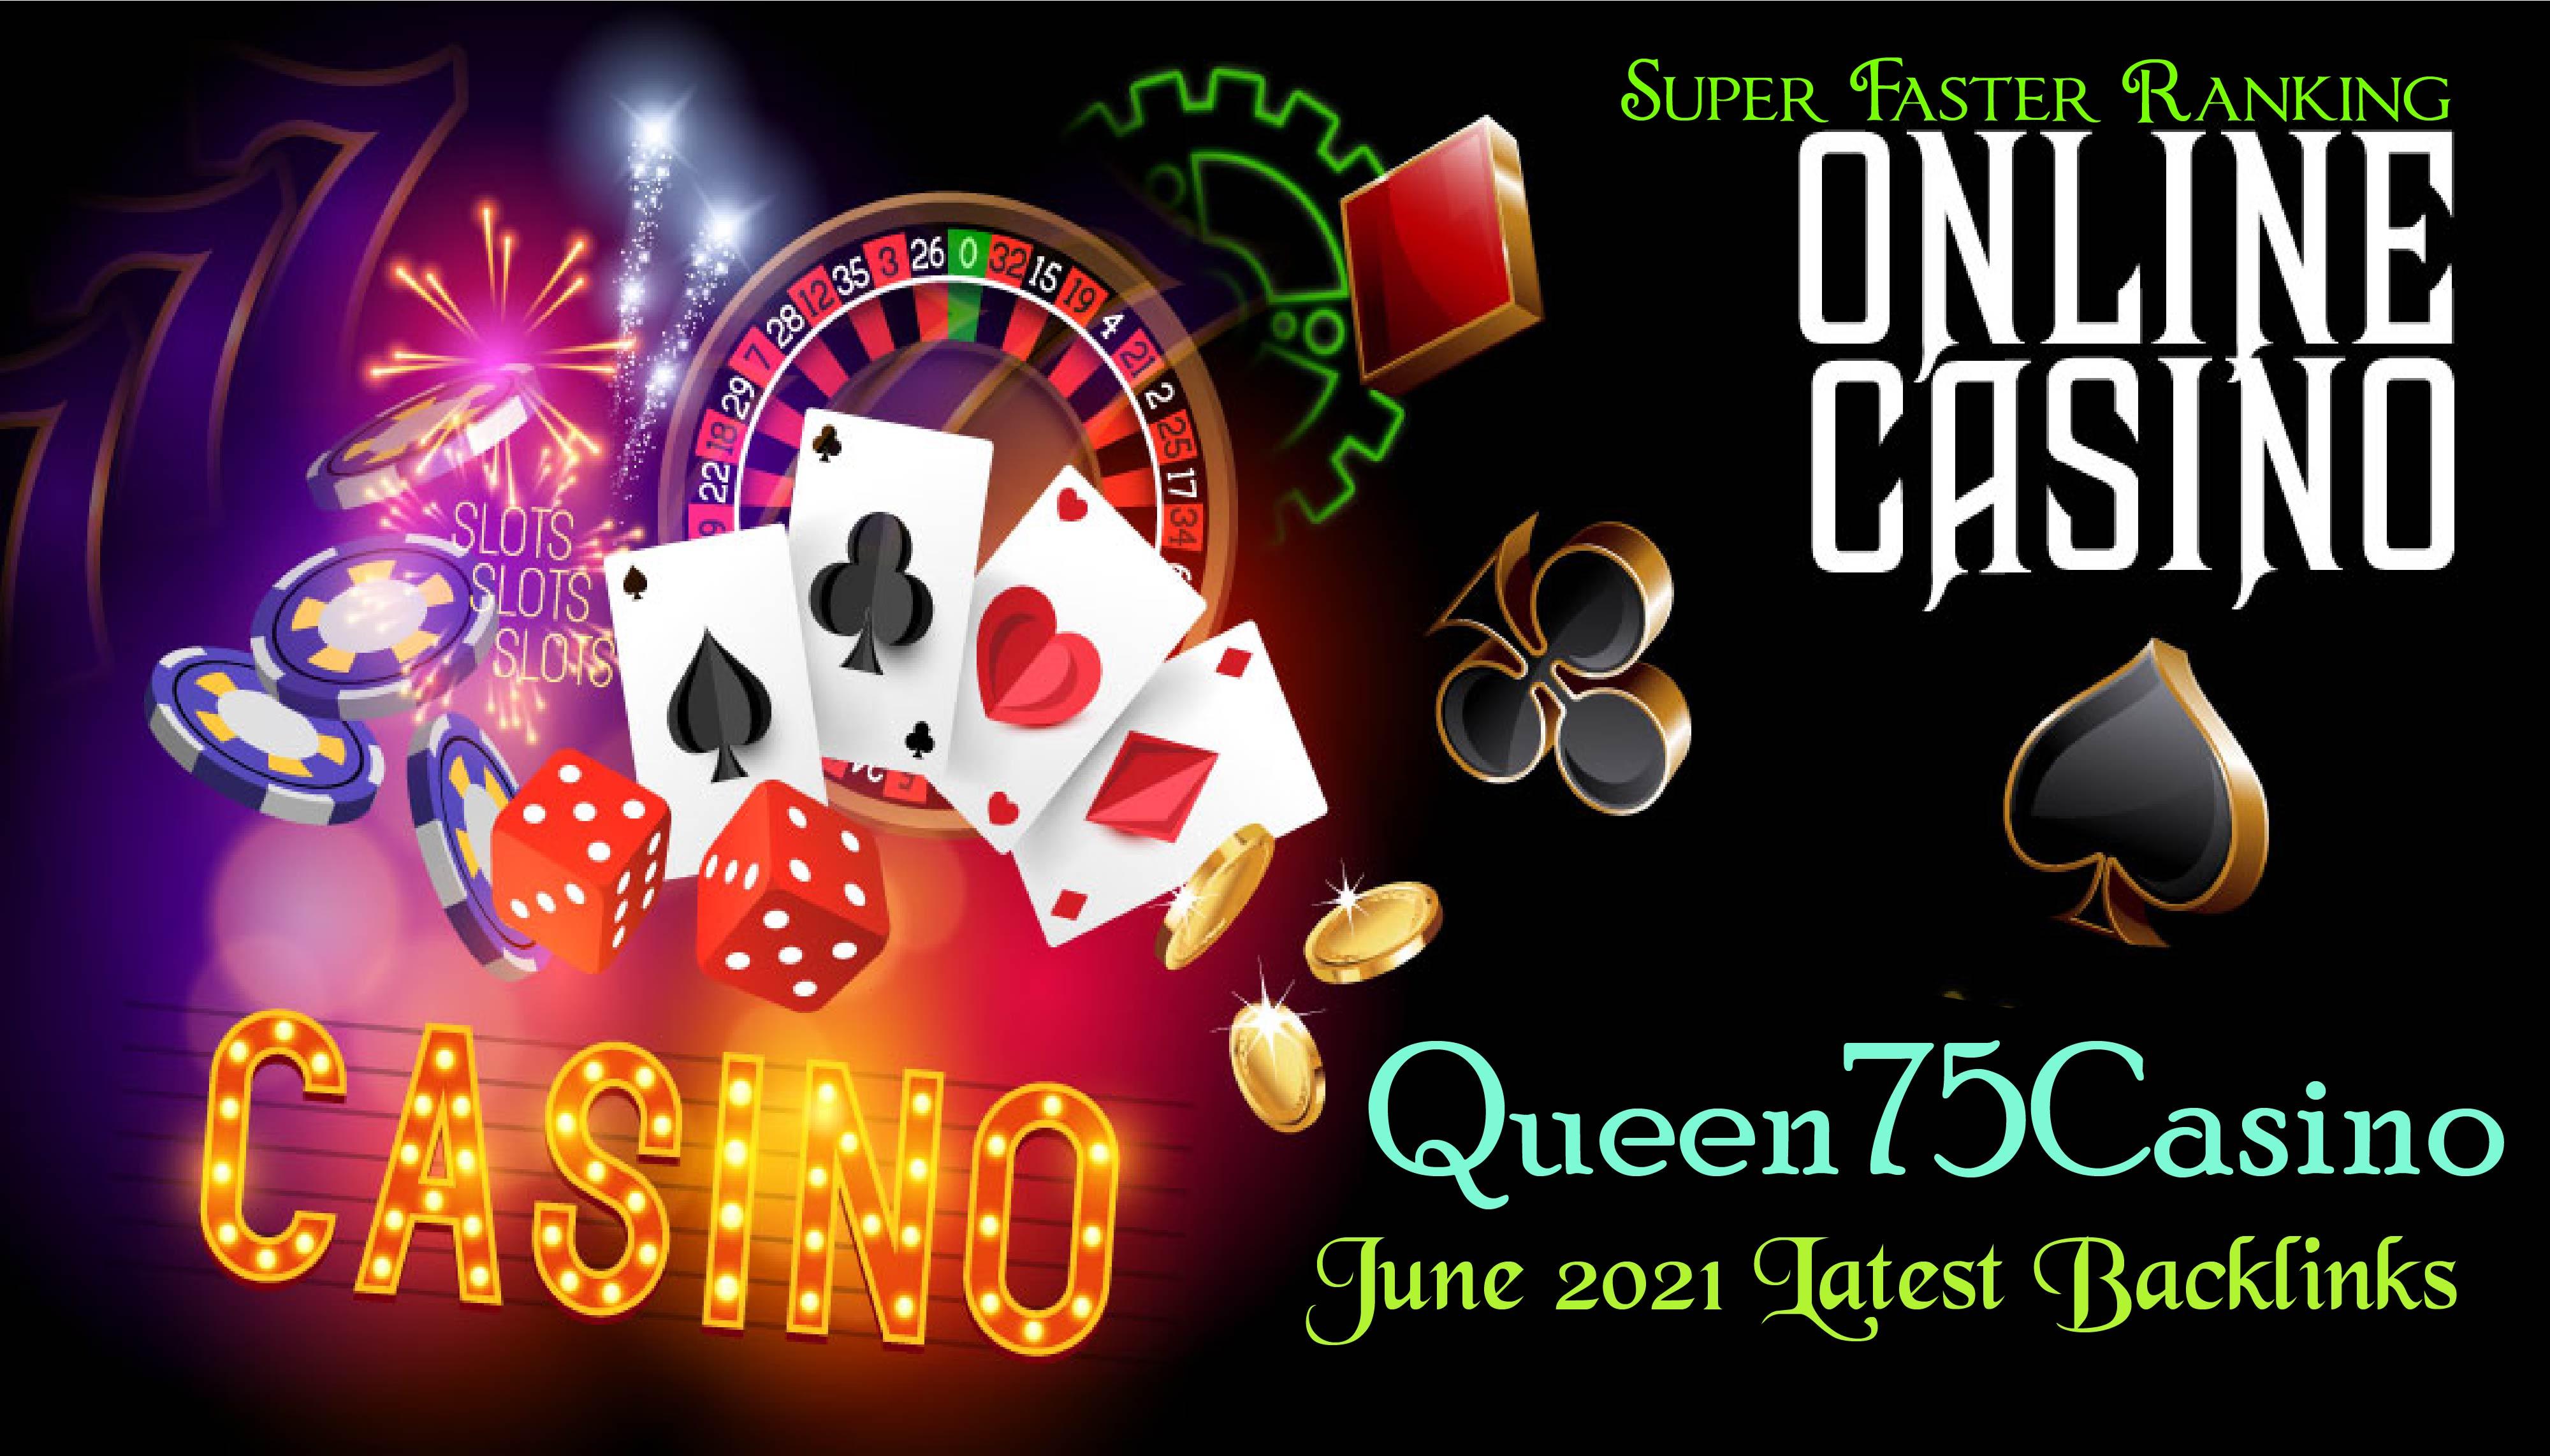 Thai skyrocket 350+ Backlink from UFABET Related Esports/Casino/slotxo/Betting/Gambling/Poker